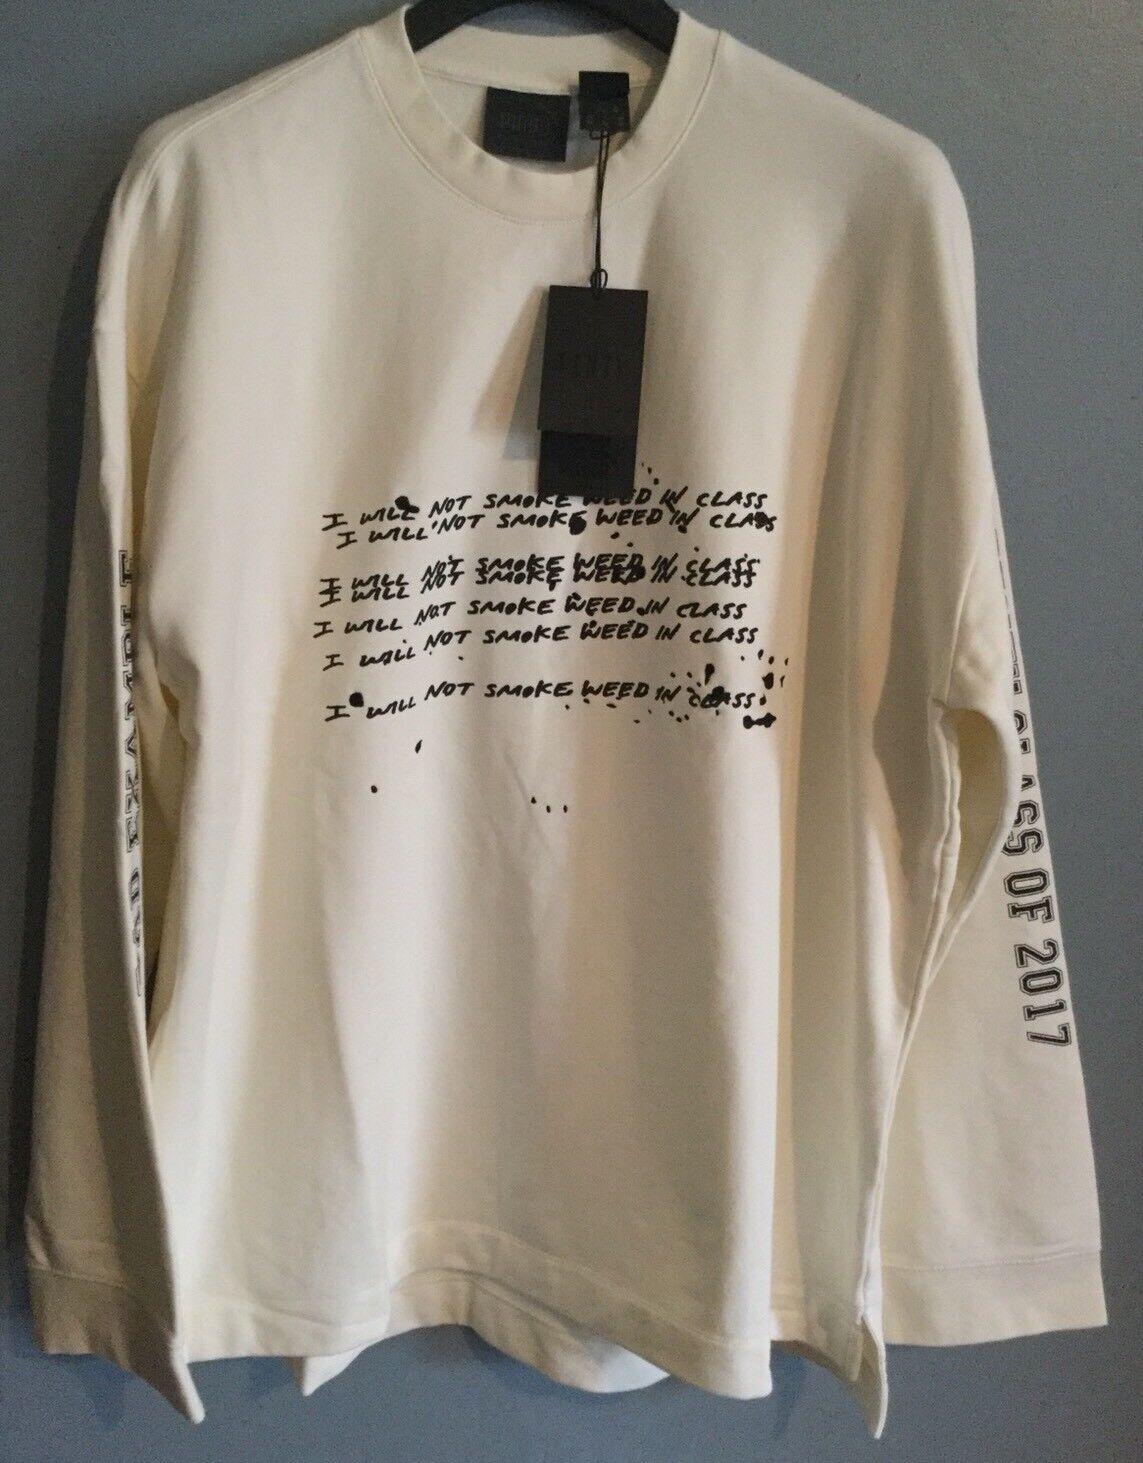 Puma Fenty damen Vanilla Ice Top Shirt Größe Medium 575871 02 Rihanna L S